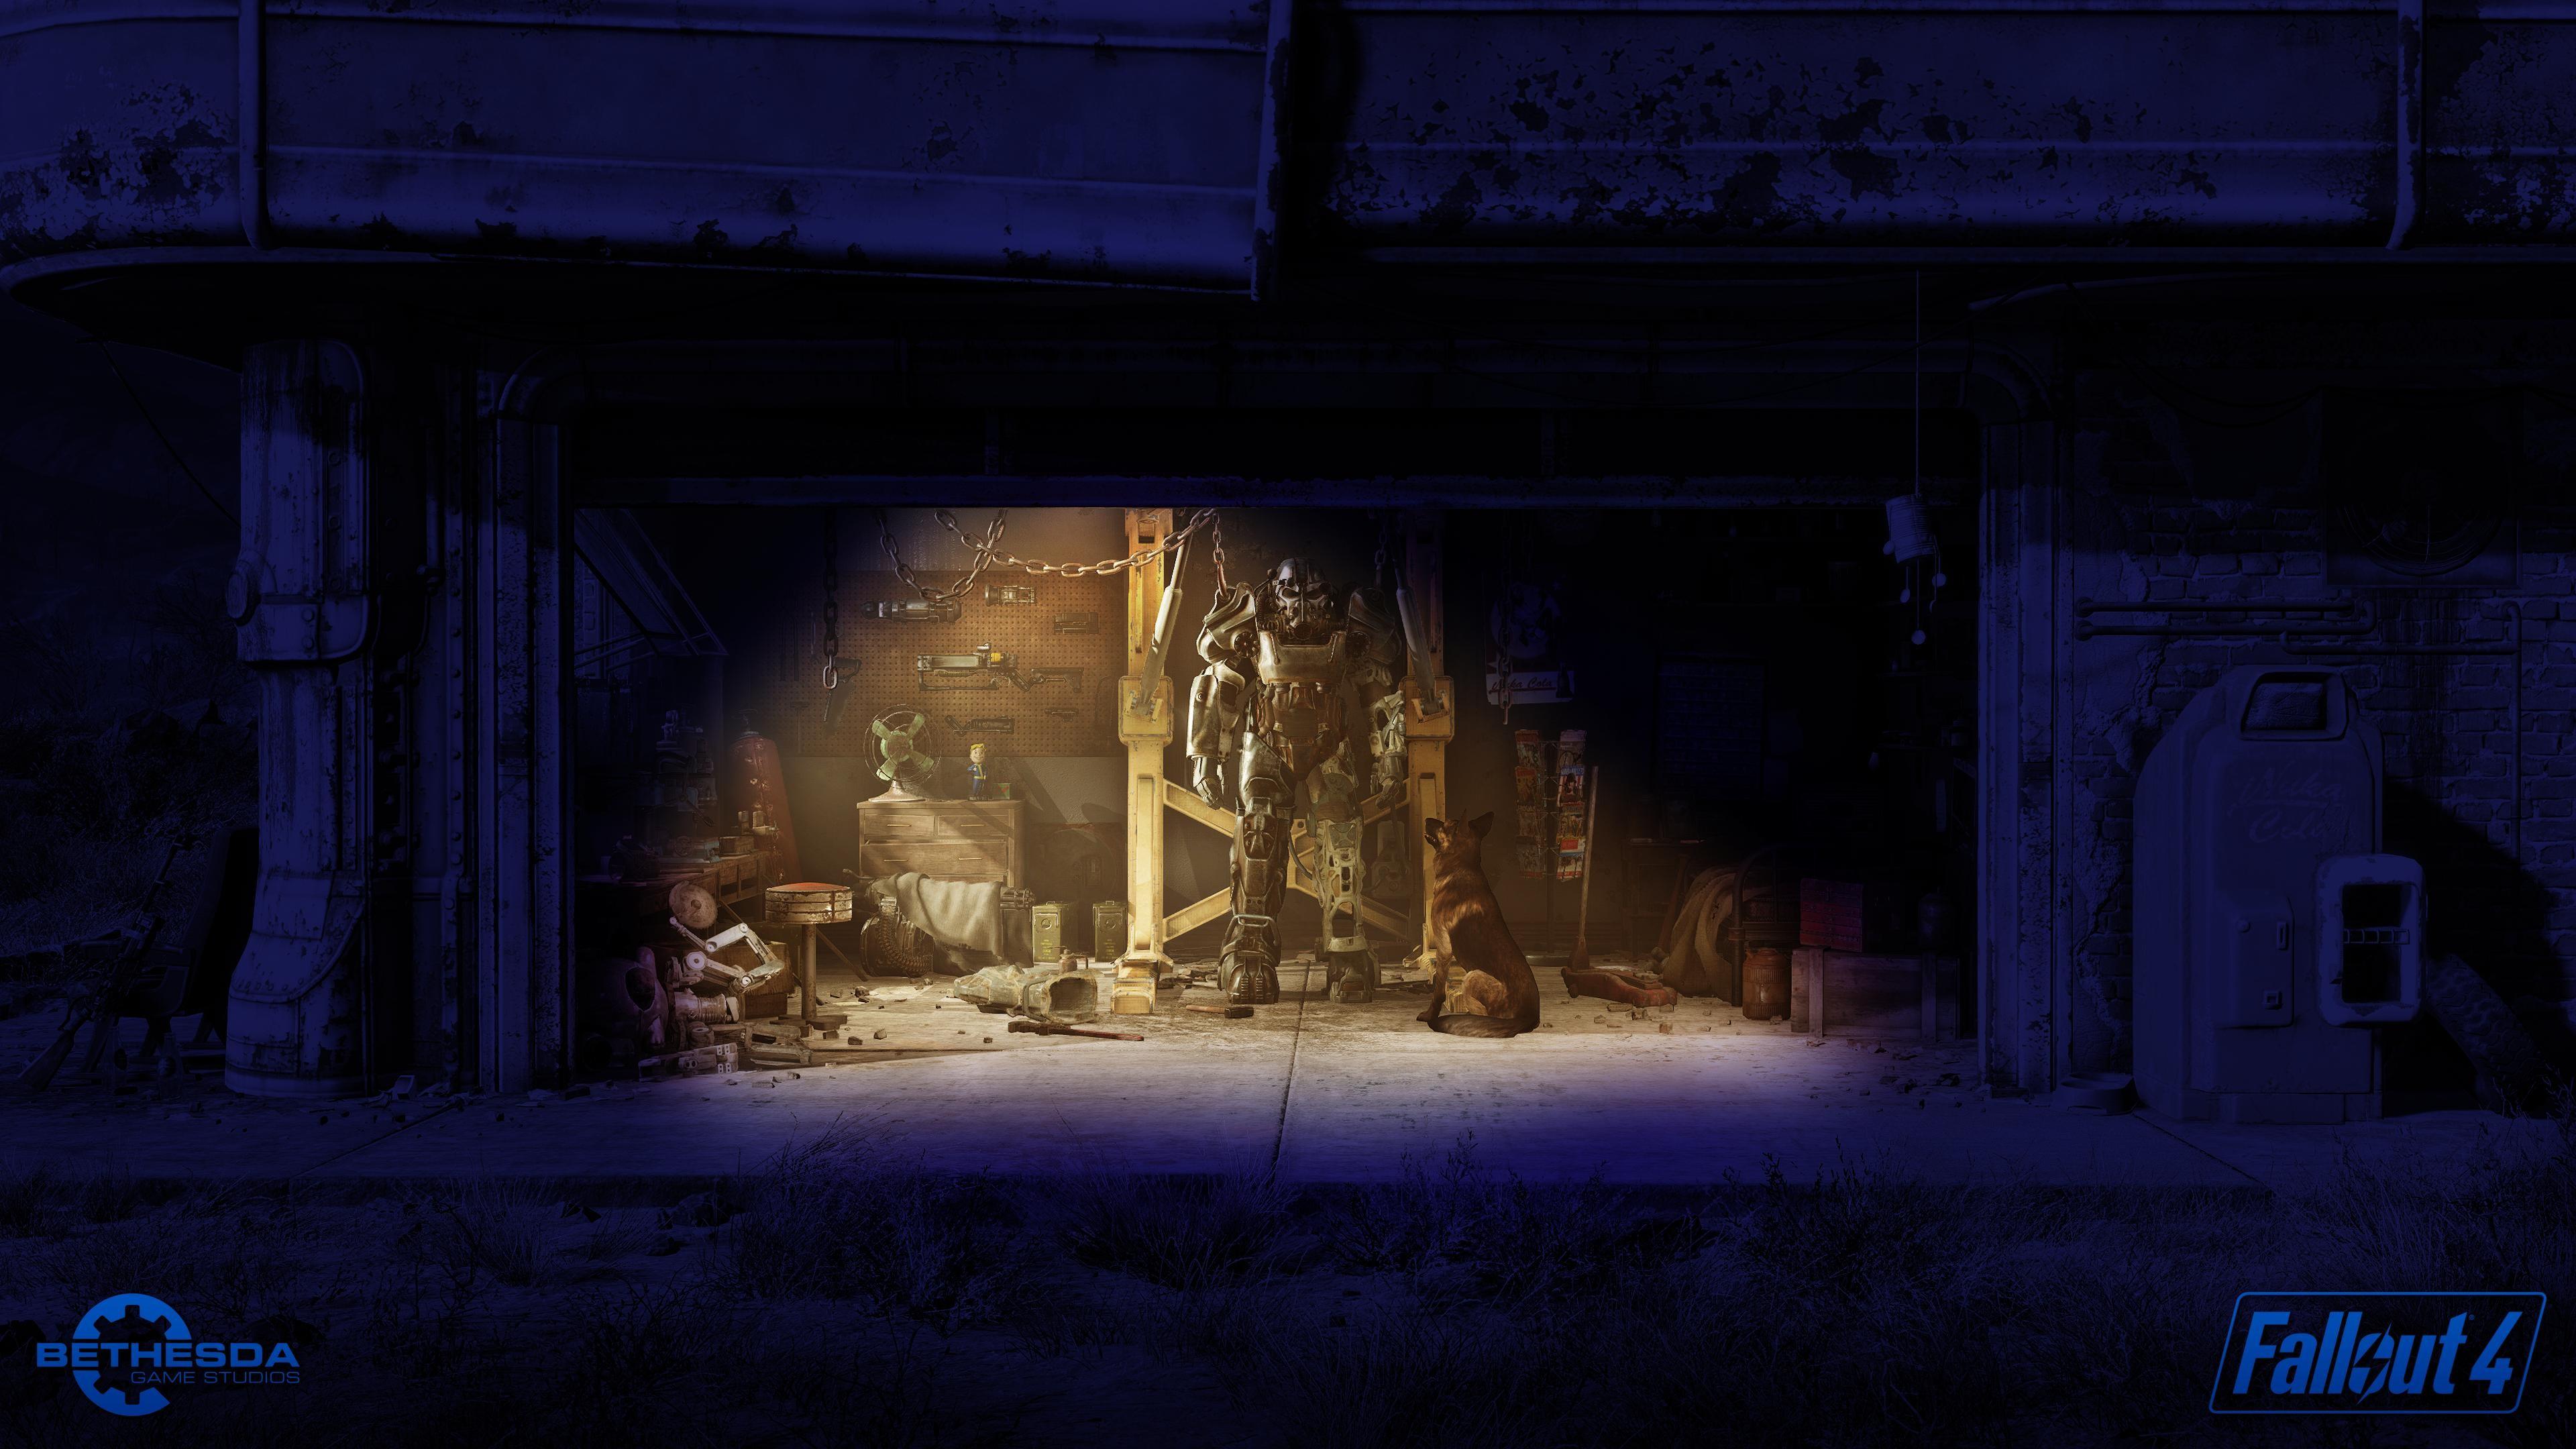 CE: Fallout 4 Wallpaper 4K, 41 Beautiful Fallout 4 4K Wallpapers